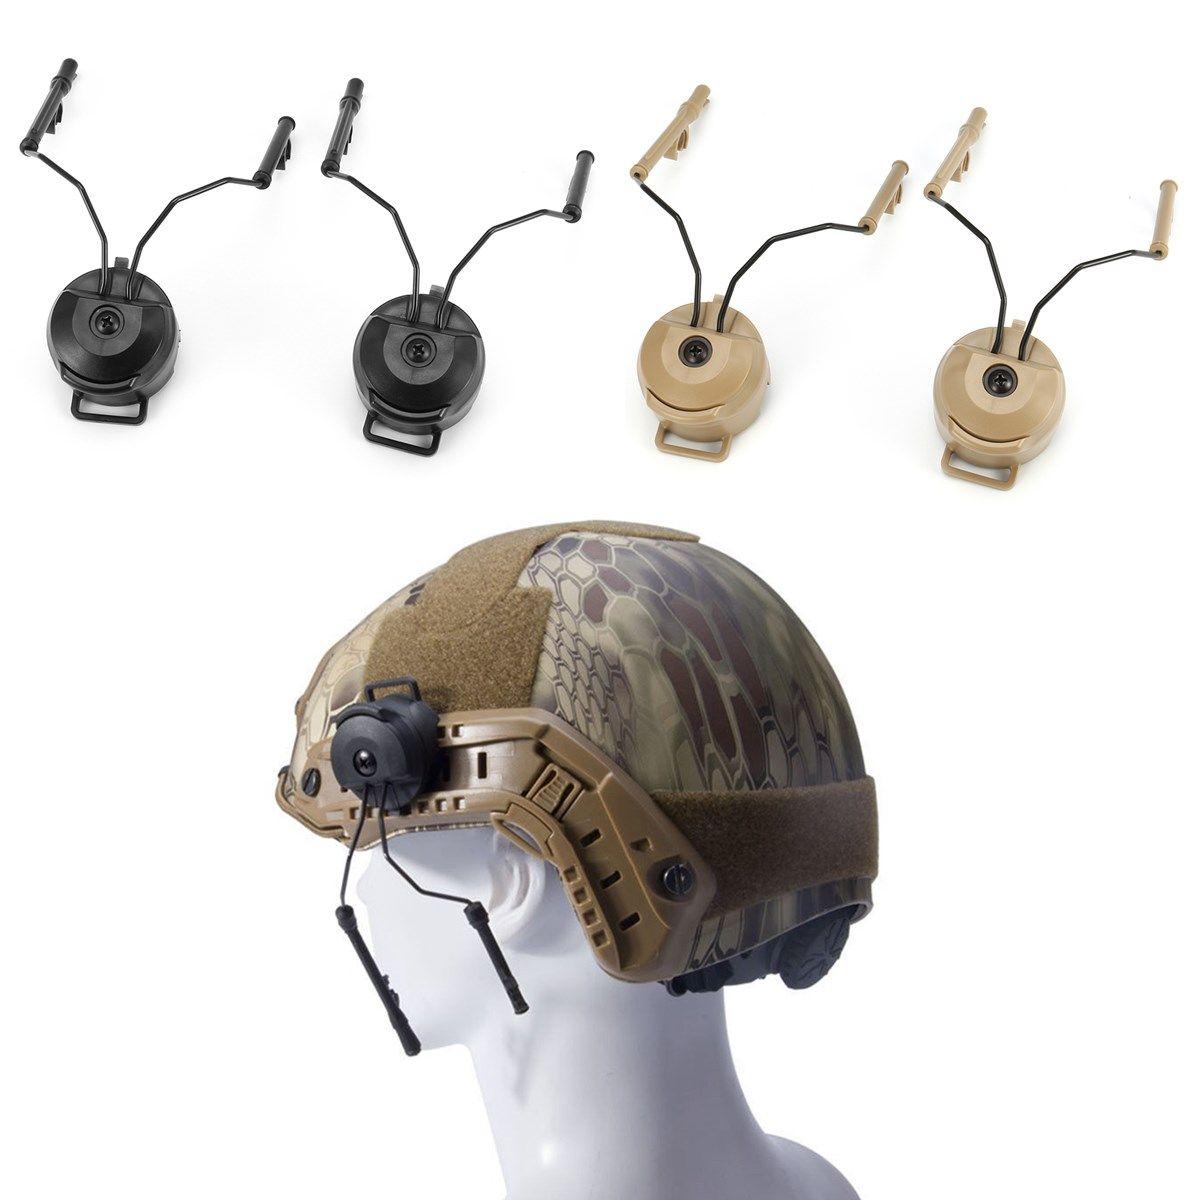 Z-tactical Helm Schienen Adapter Set Für Comtac Headset Military Helm Adapter Peltor Comtac Kopfhörer Helm Schiene Airsoft